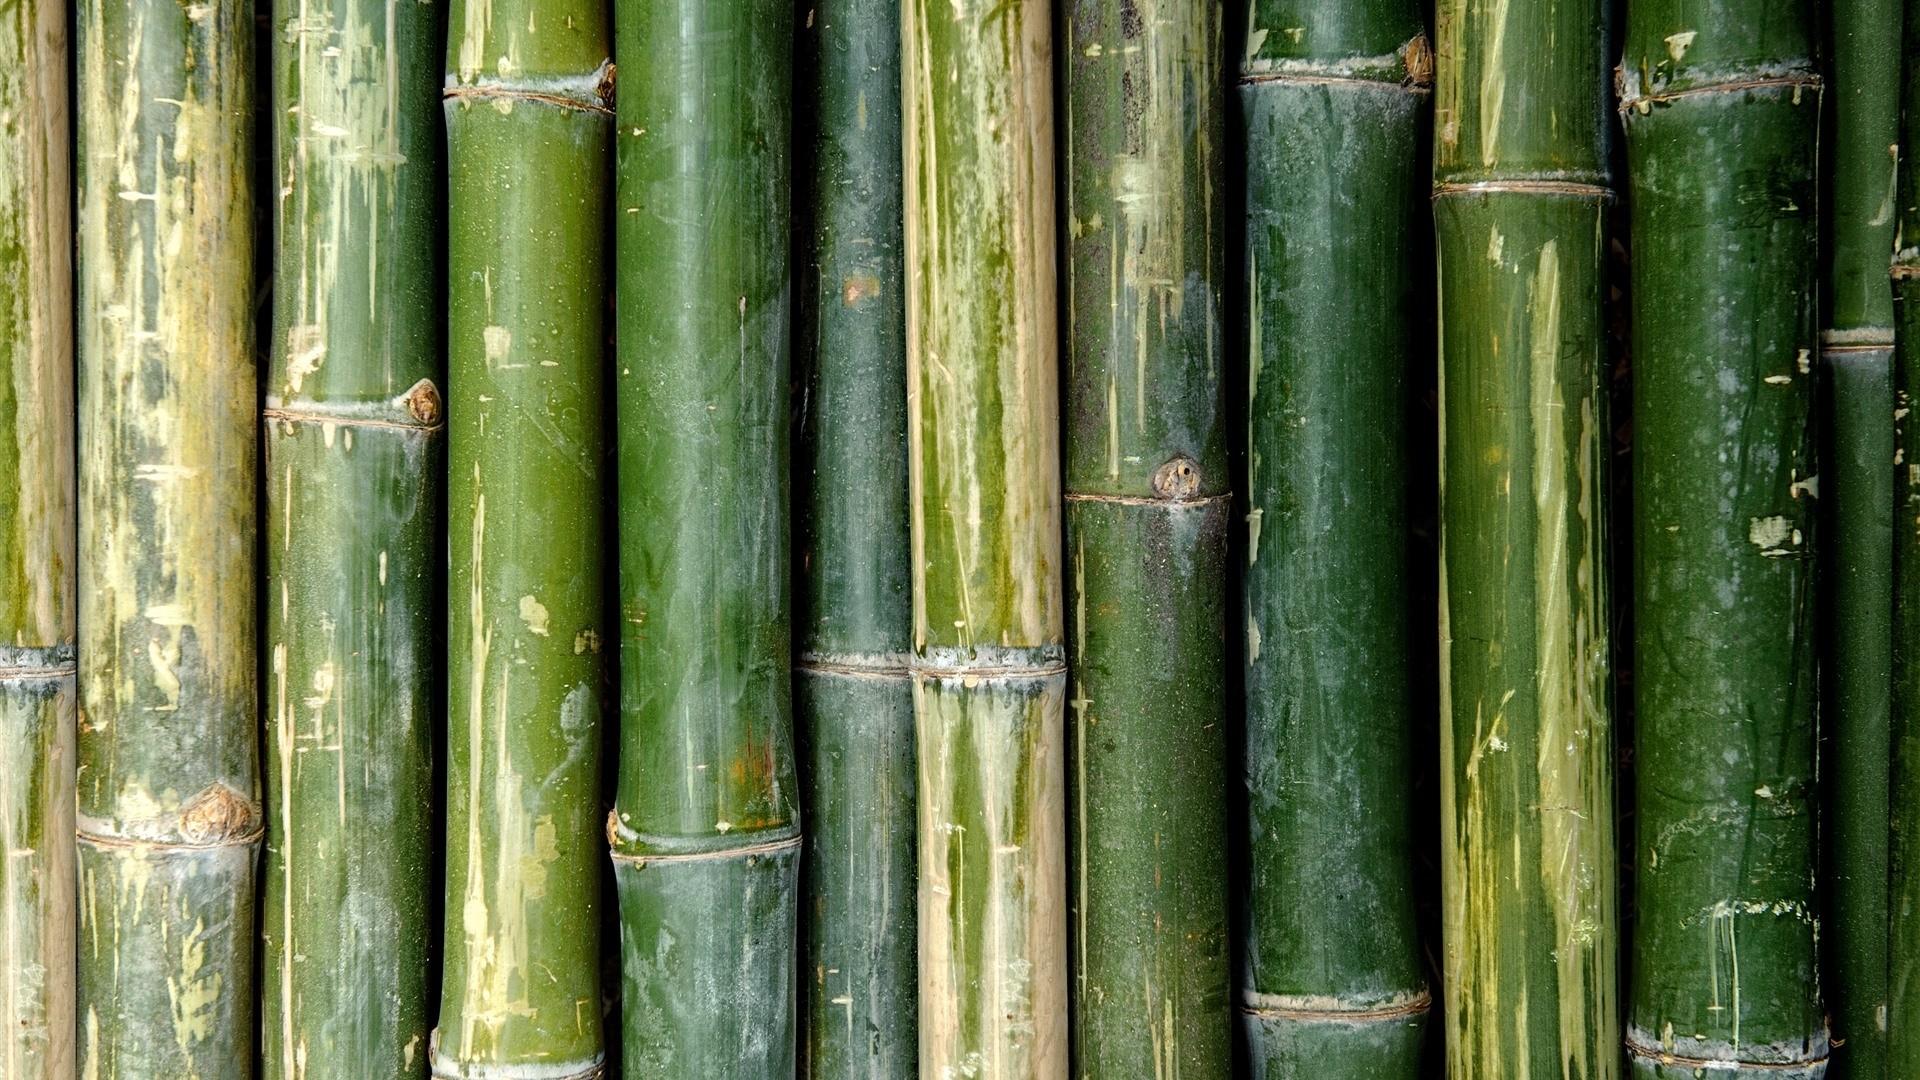 Bamboo Free Wallpaper